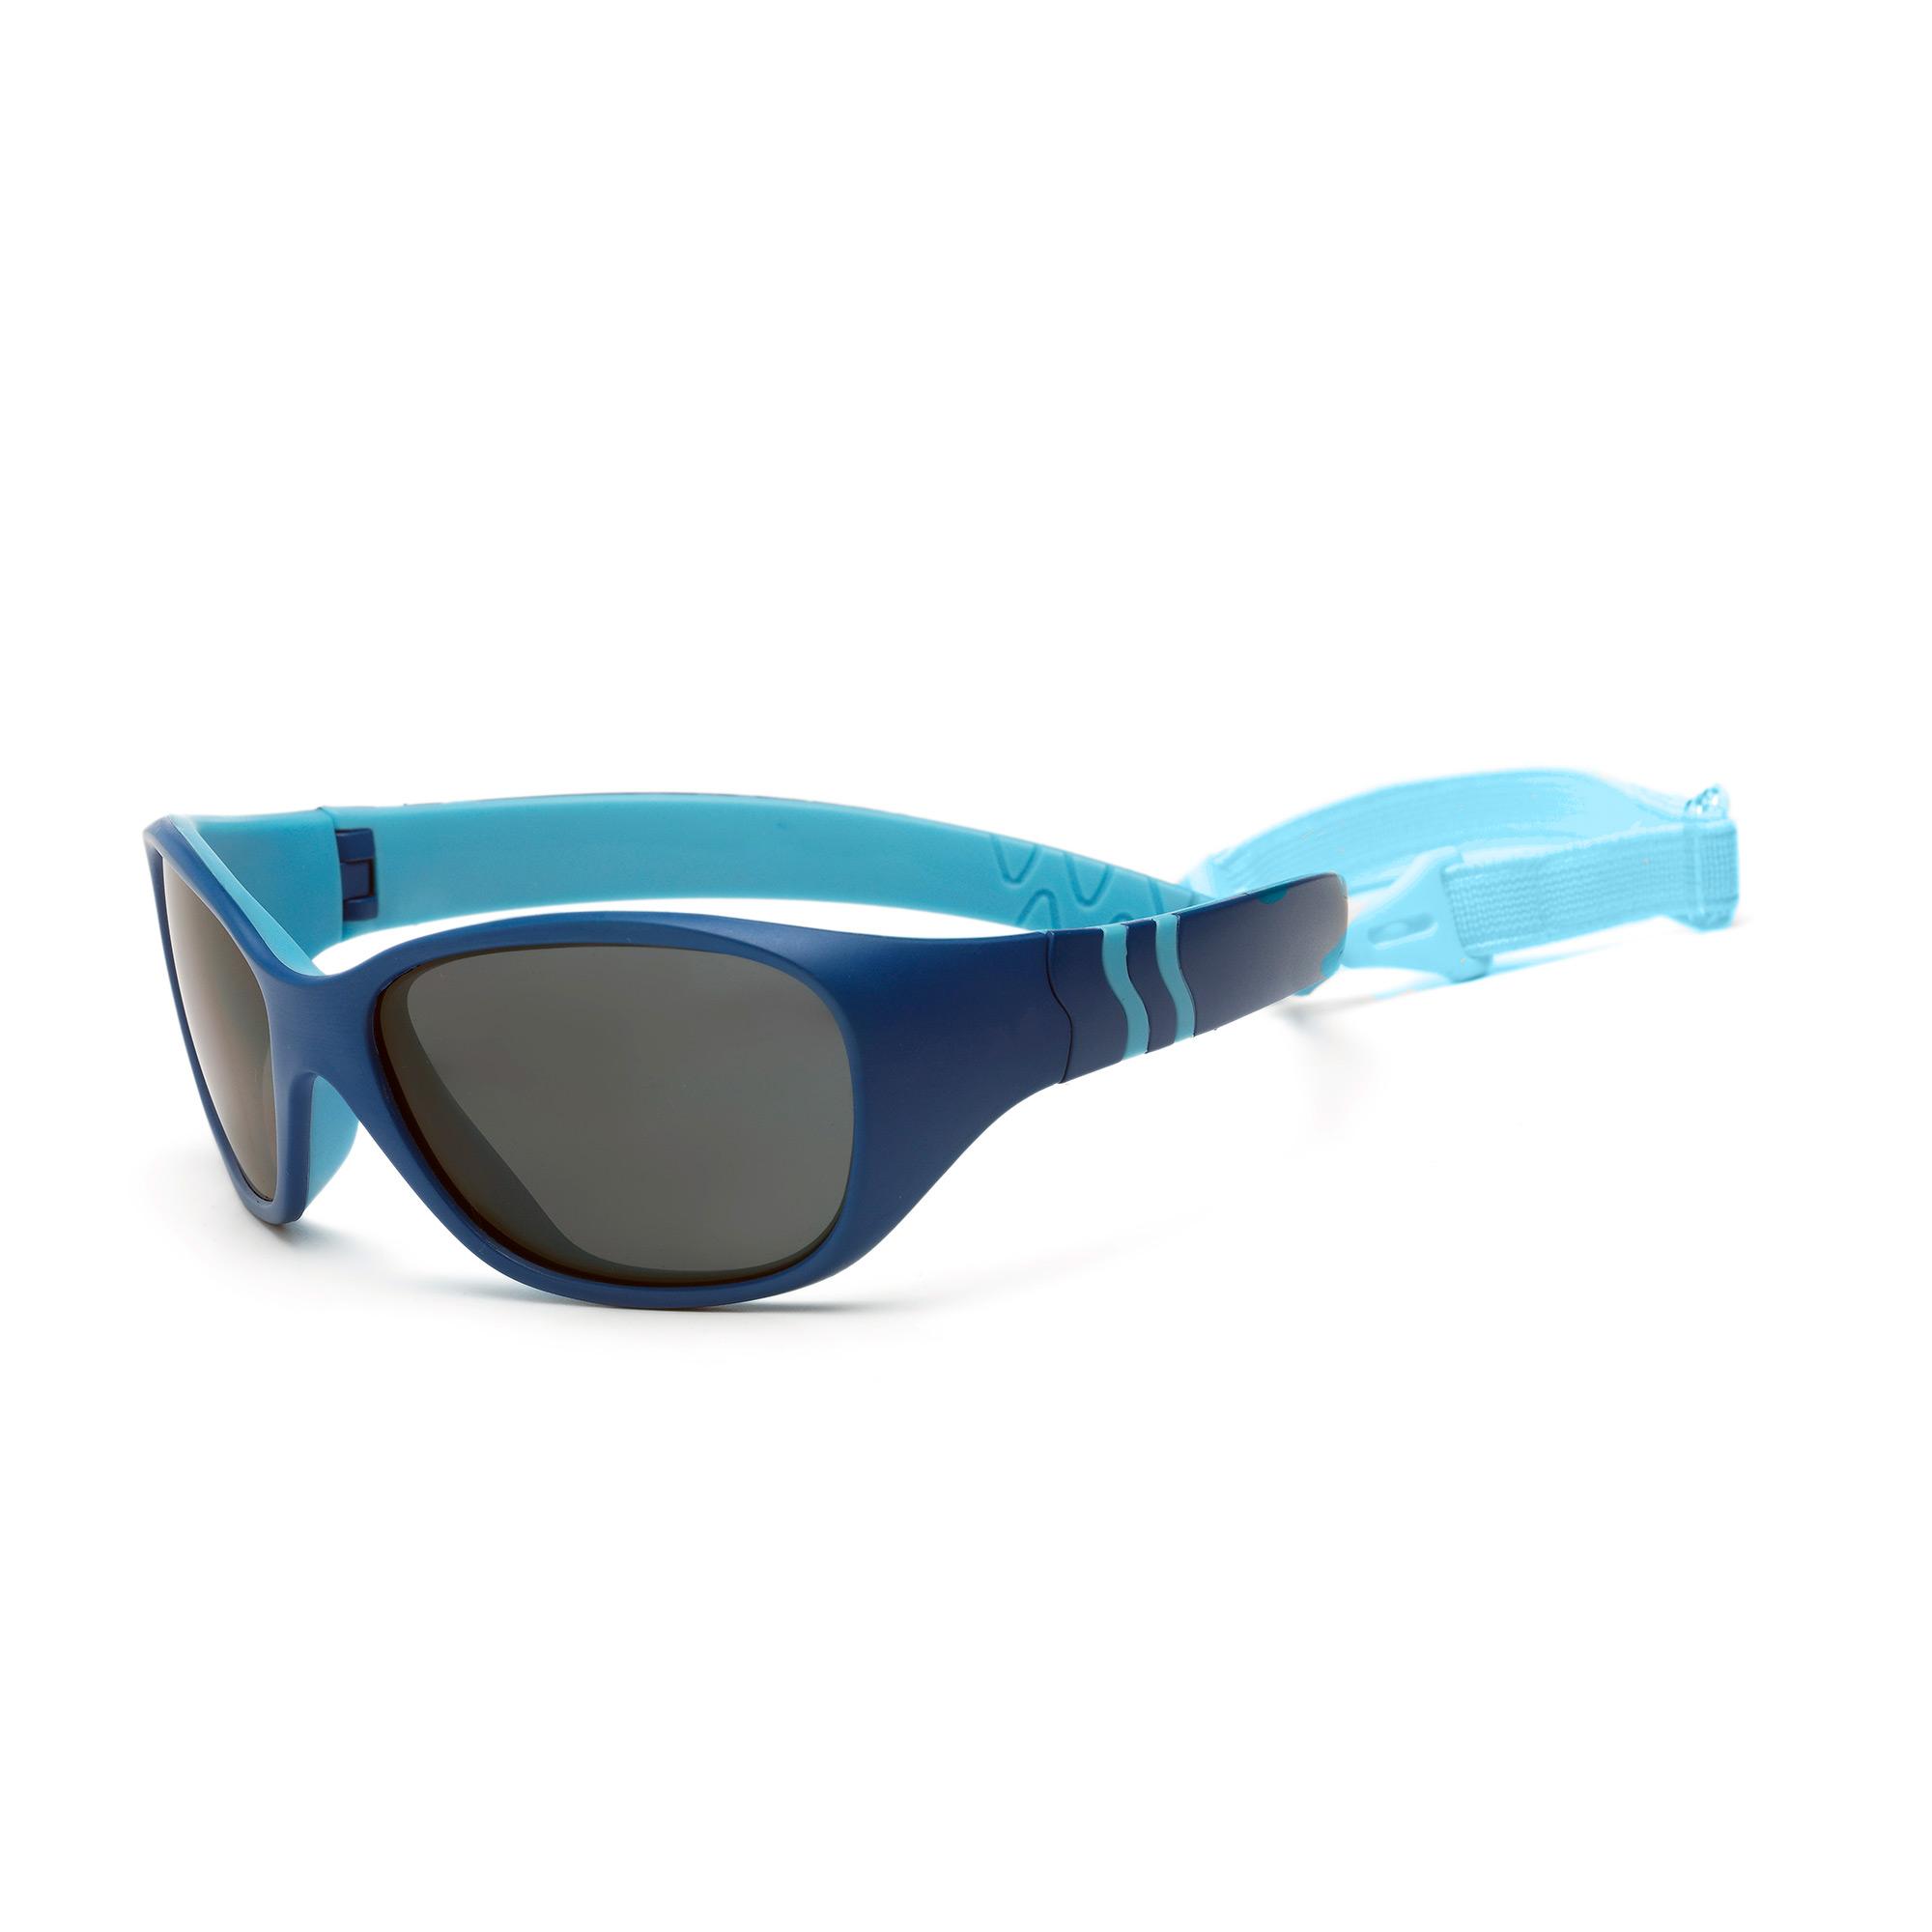 b2beb92362bf Adventure Sunglasses for Kids | Unbreakable Sunglasses | Real Kids ...